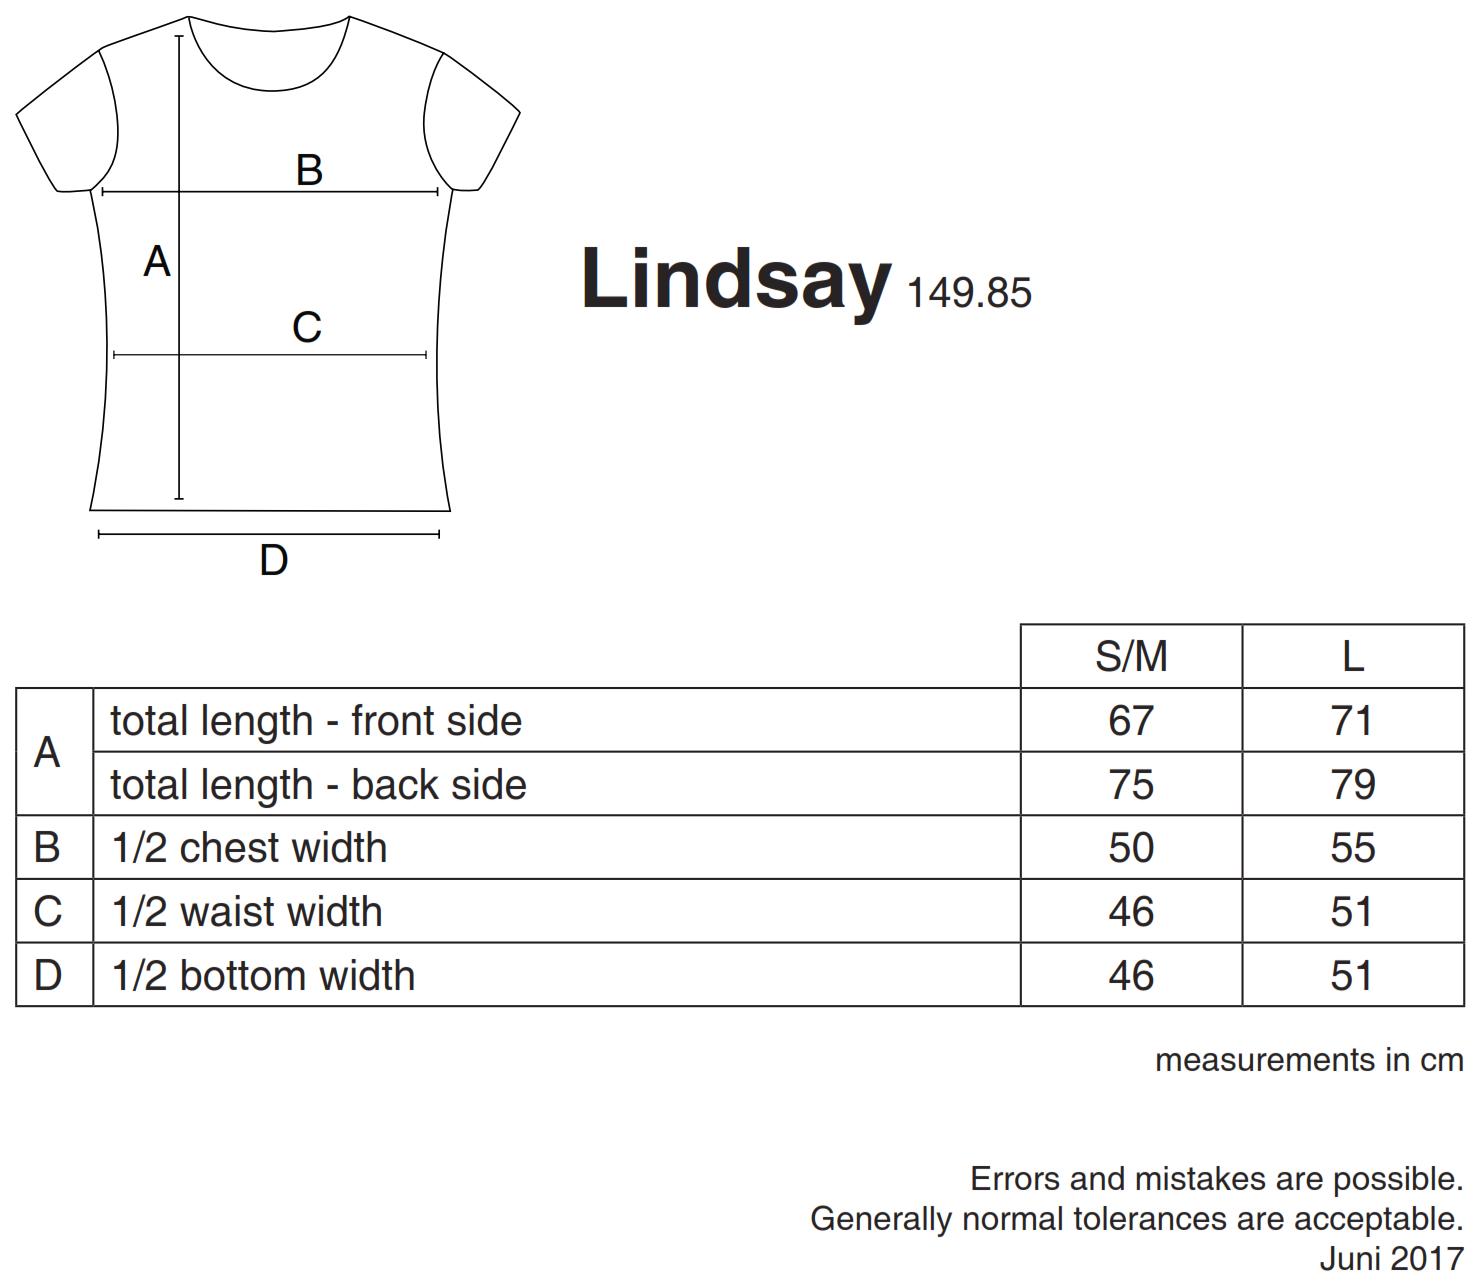 nakedshirt: Lindsay Women`s Loose Fashion T-Shirt TF-RL-O-BL127